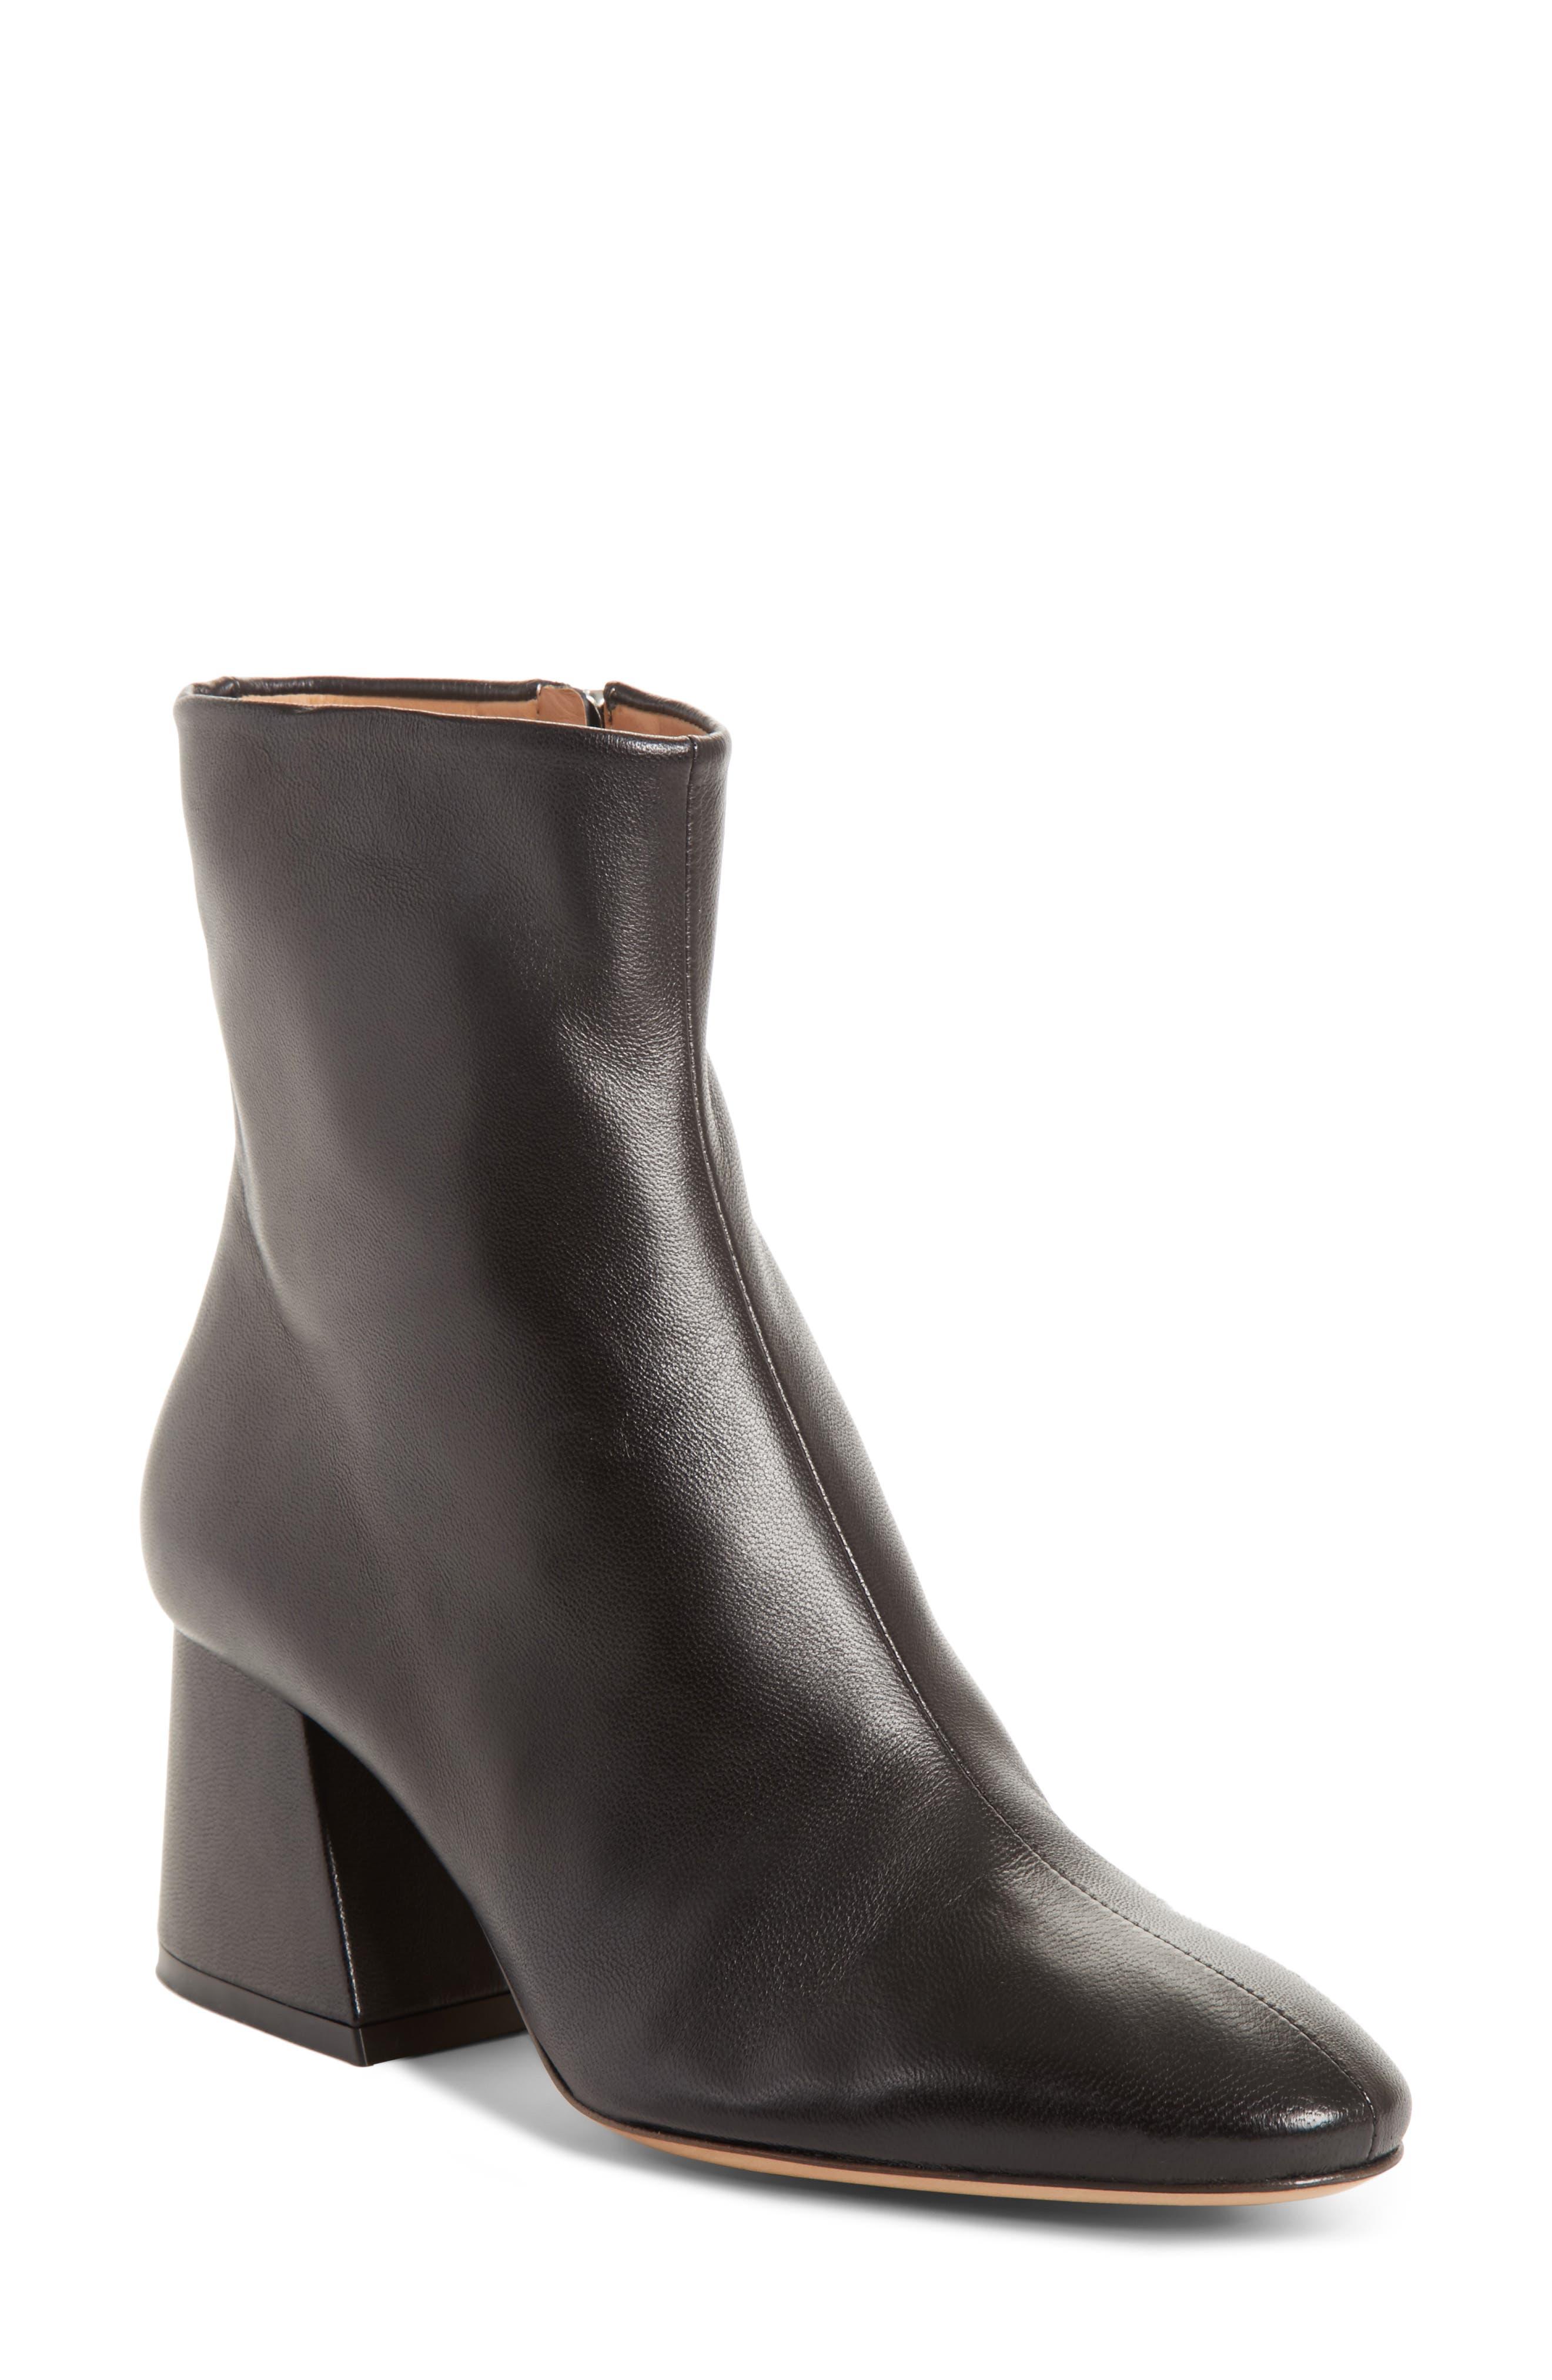 Alternate Image 1 Selected - Maison Margiela Flare Heel Ankle Boot (Women)